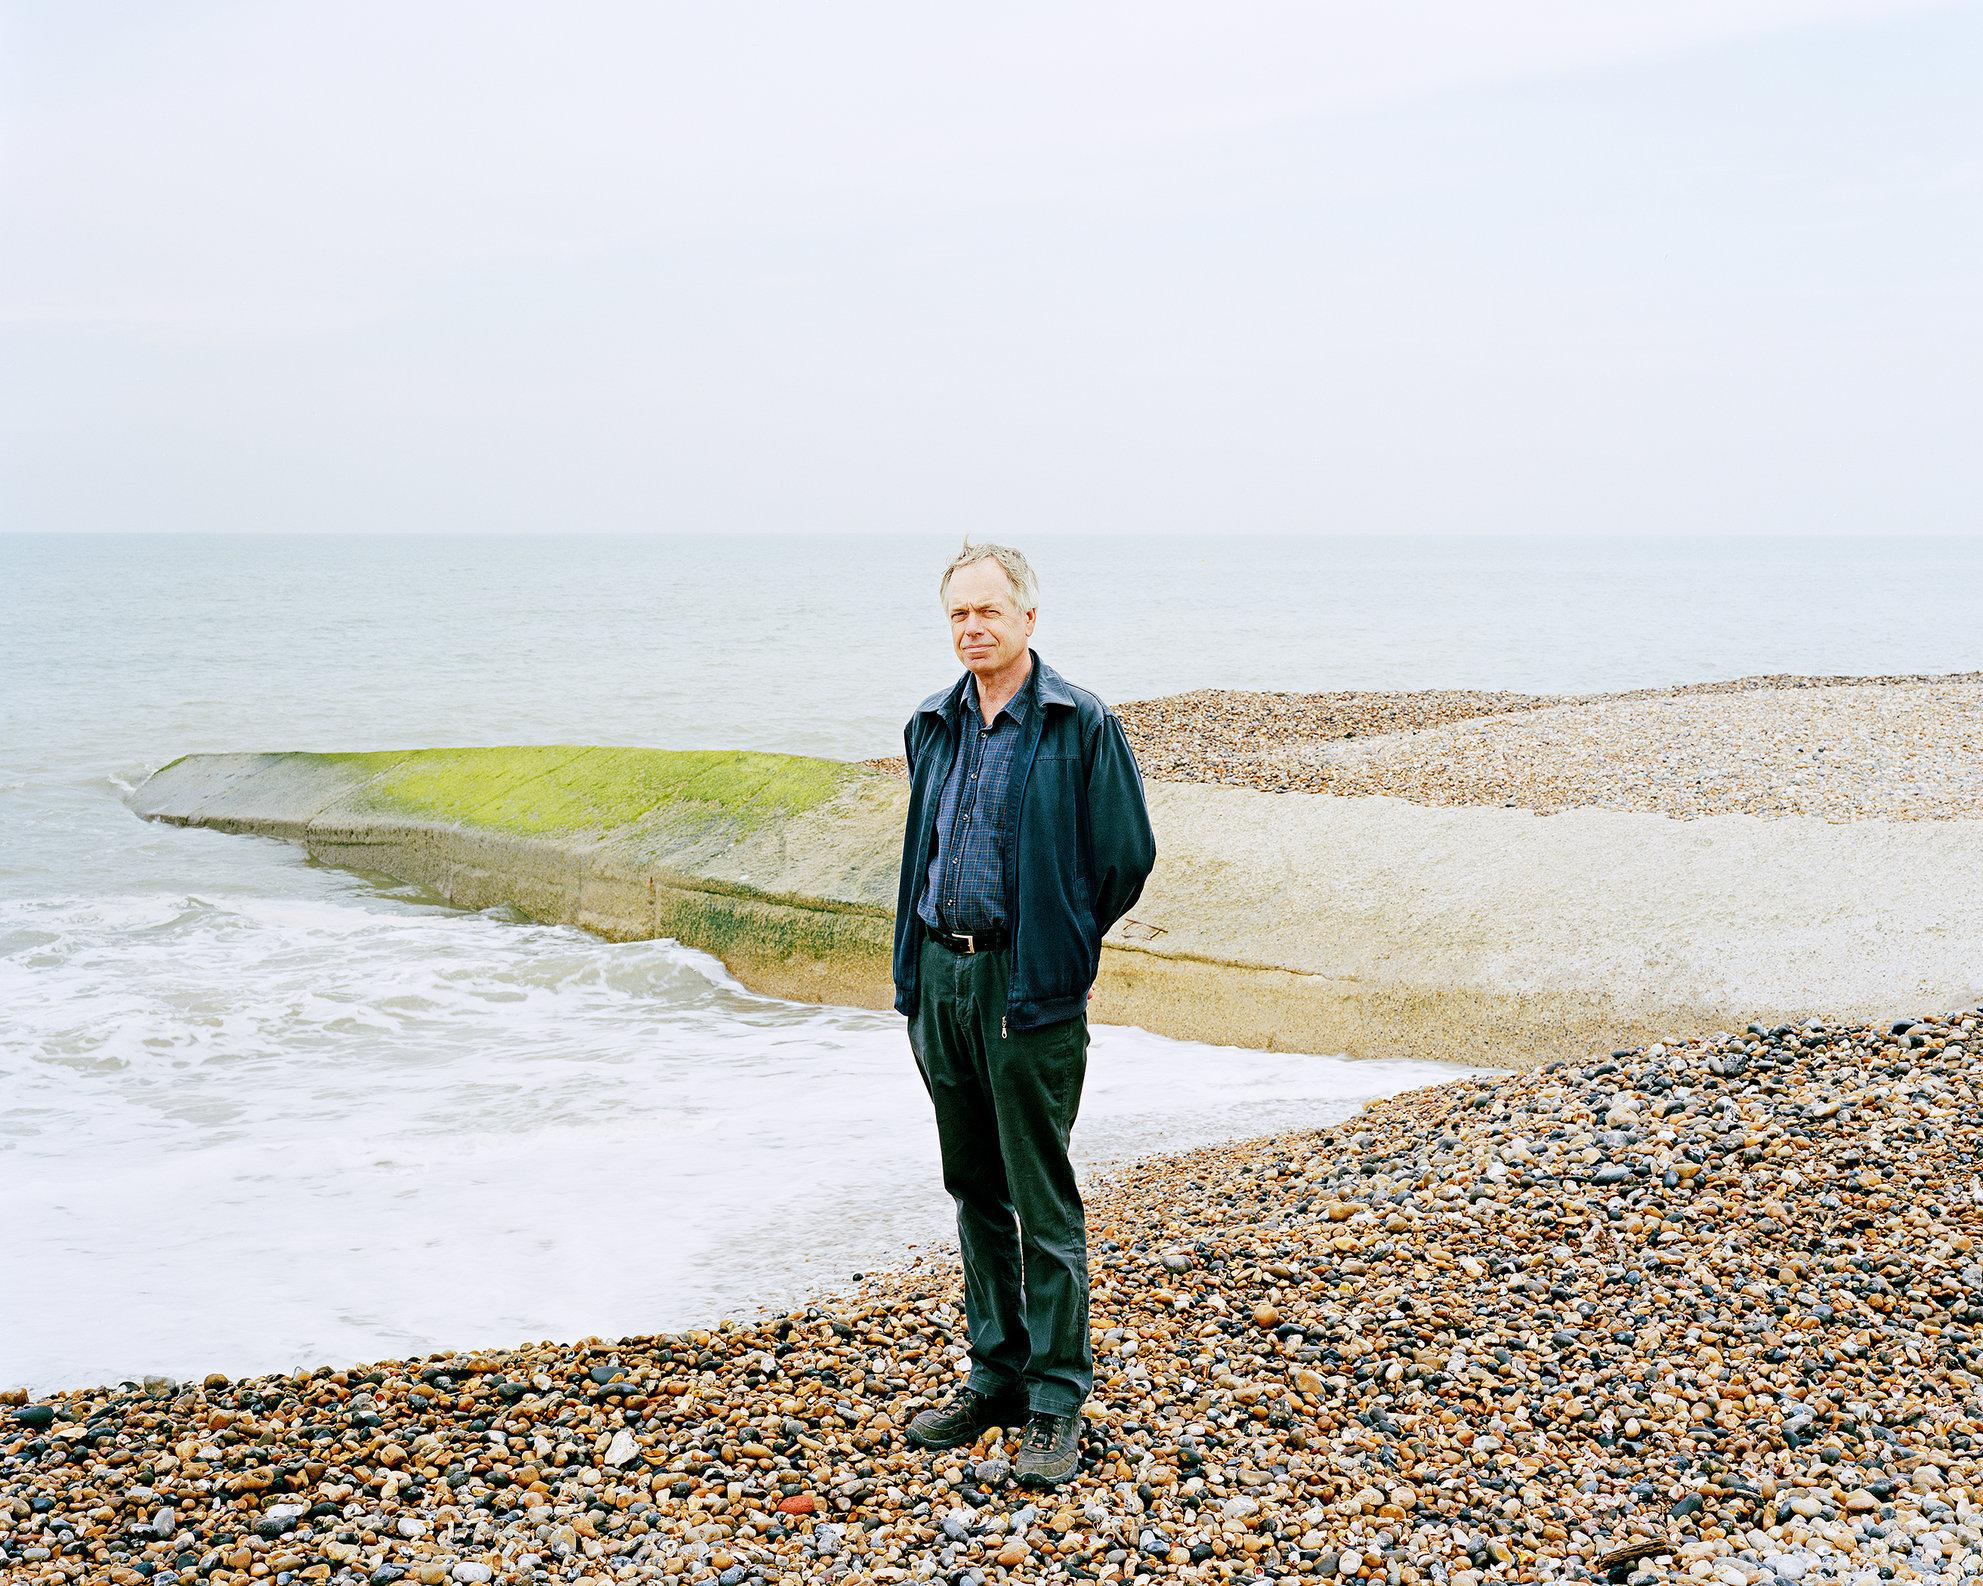 Martin Eade, Coast Protection Engineer, Brighton & Hove City Council.